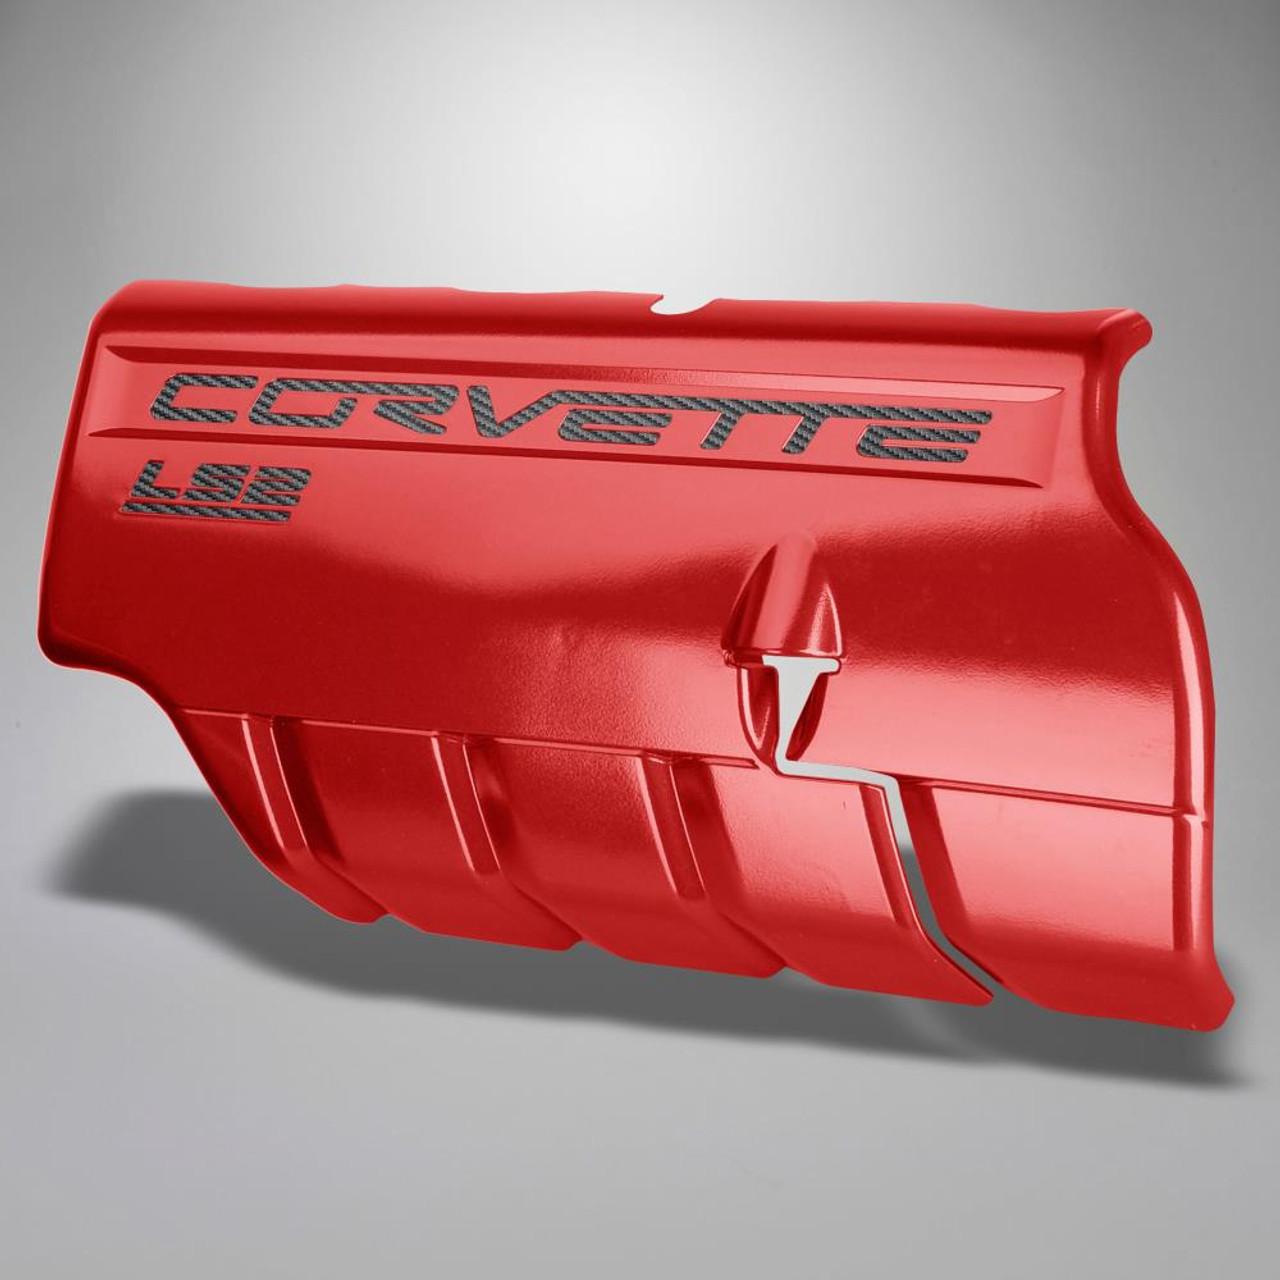 C6 Corvette LS2 Letter Kit - Carbon Fiber